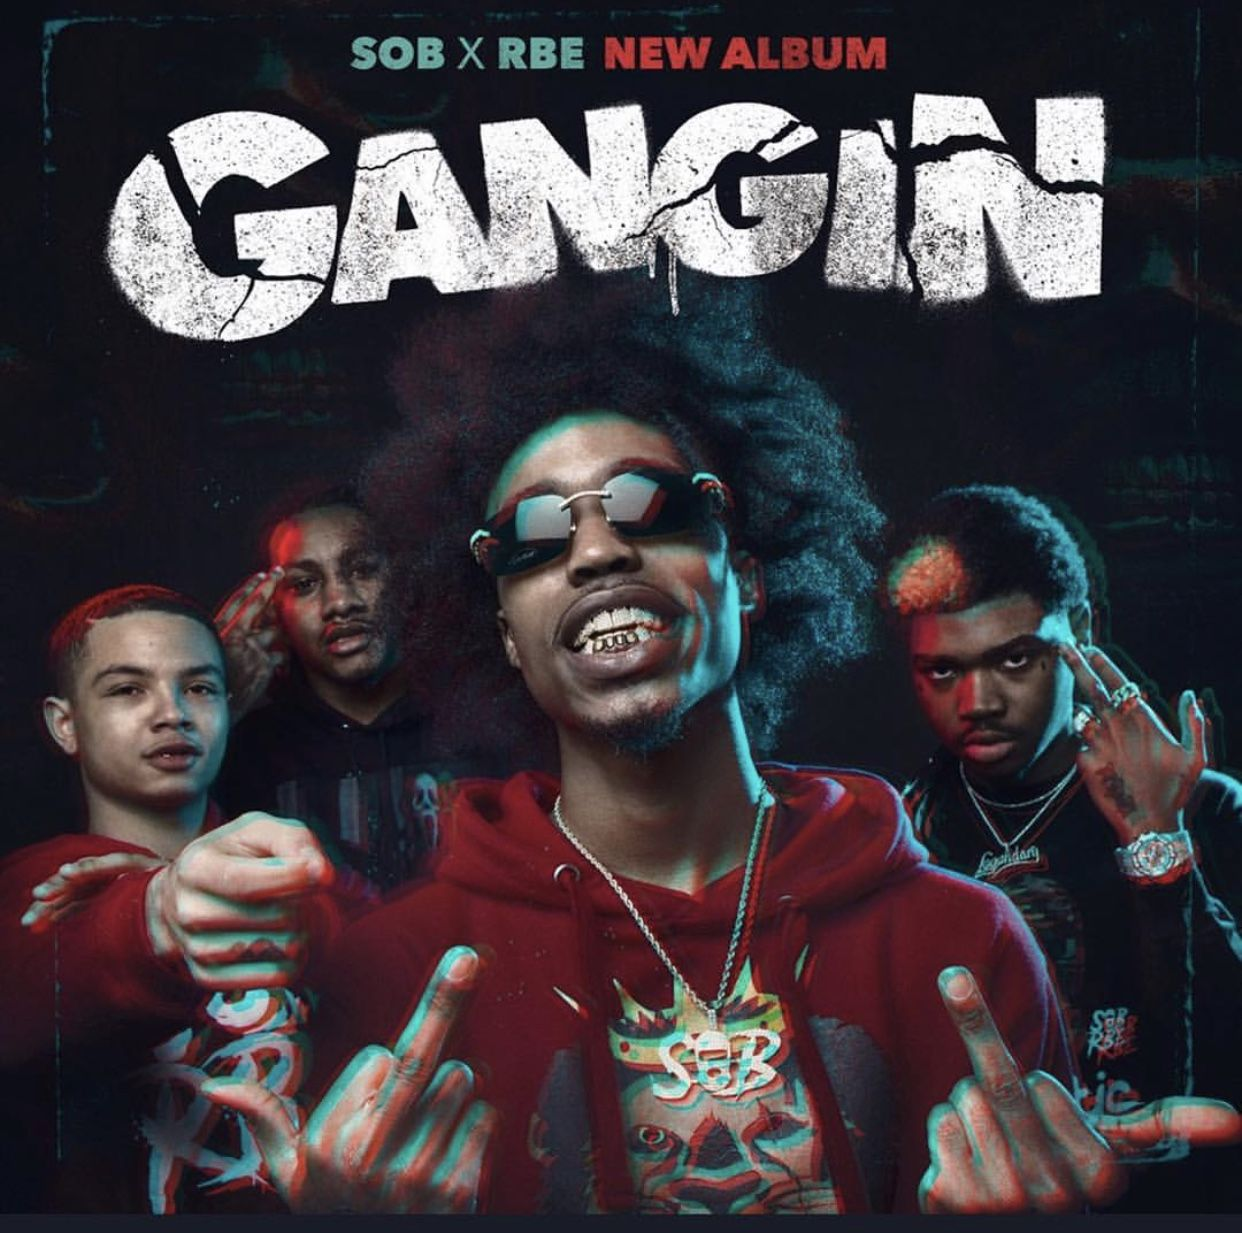 Gangin X Sob X Rbe Rap Wallpaper Album Covers Rappers